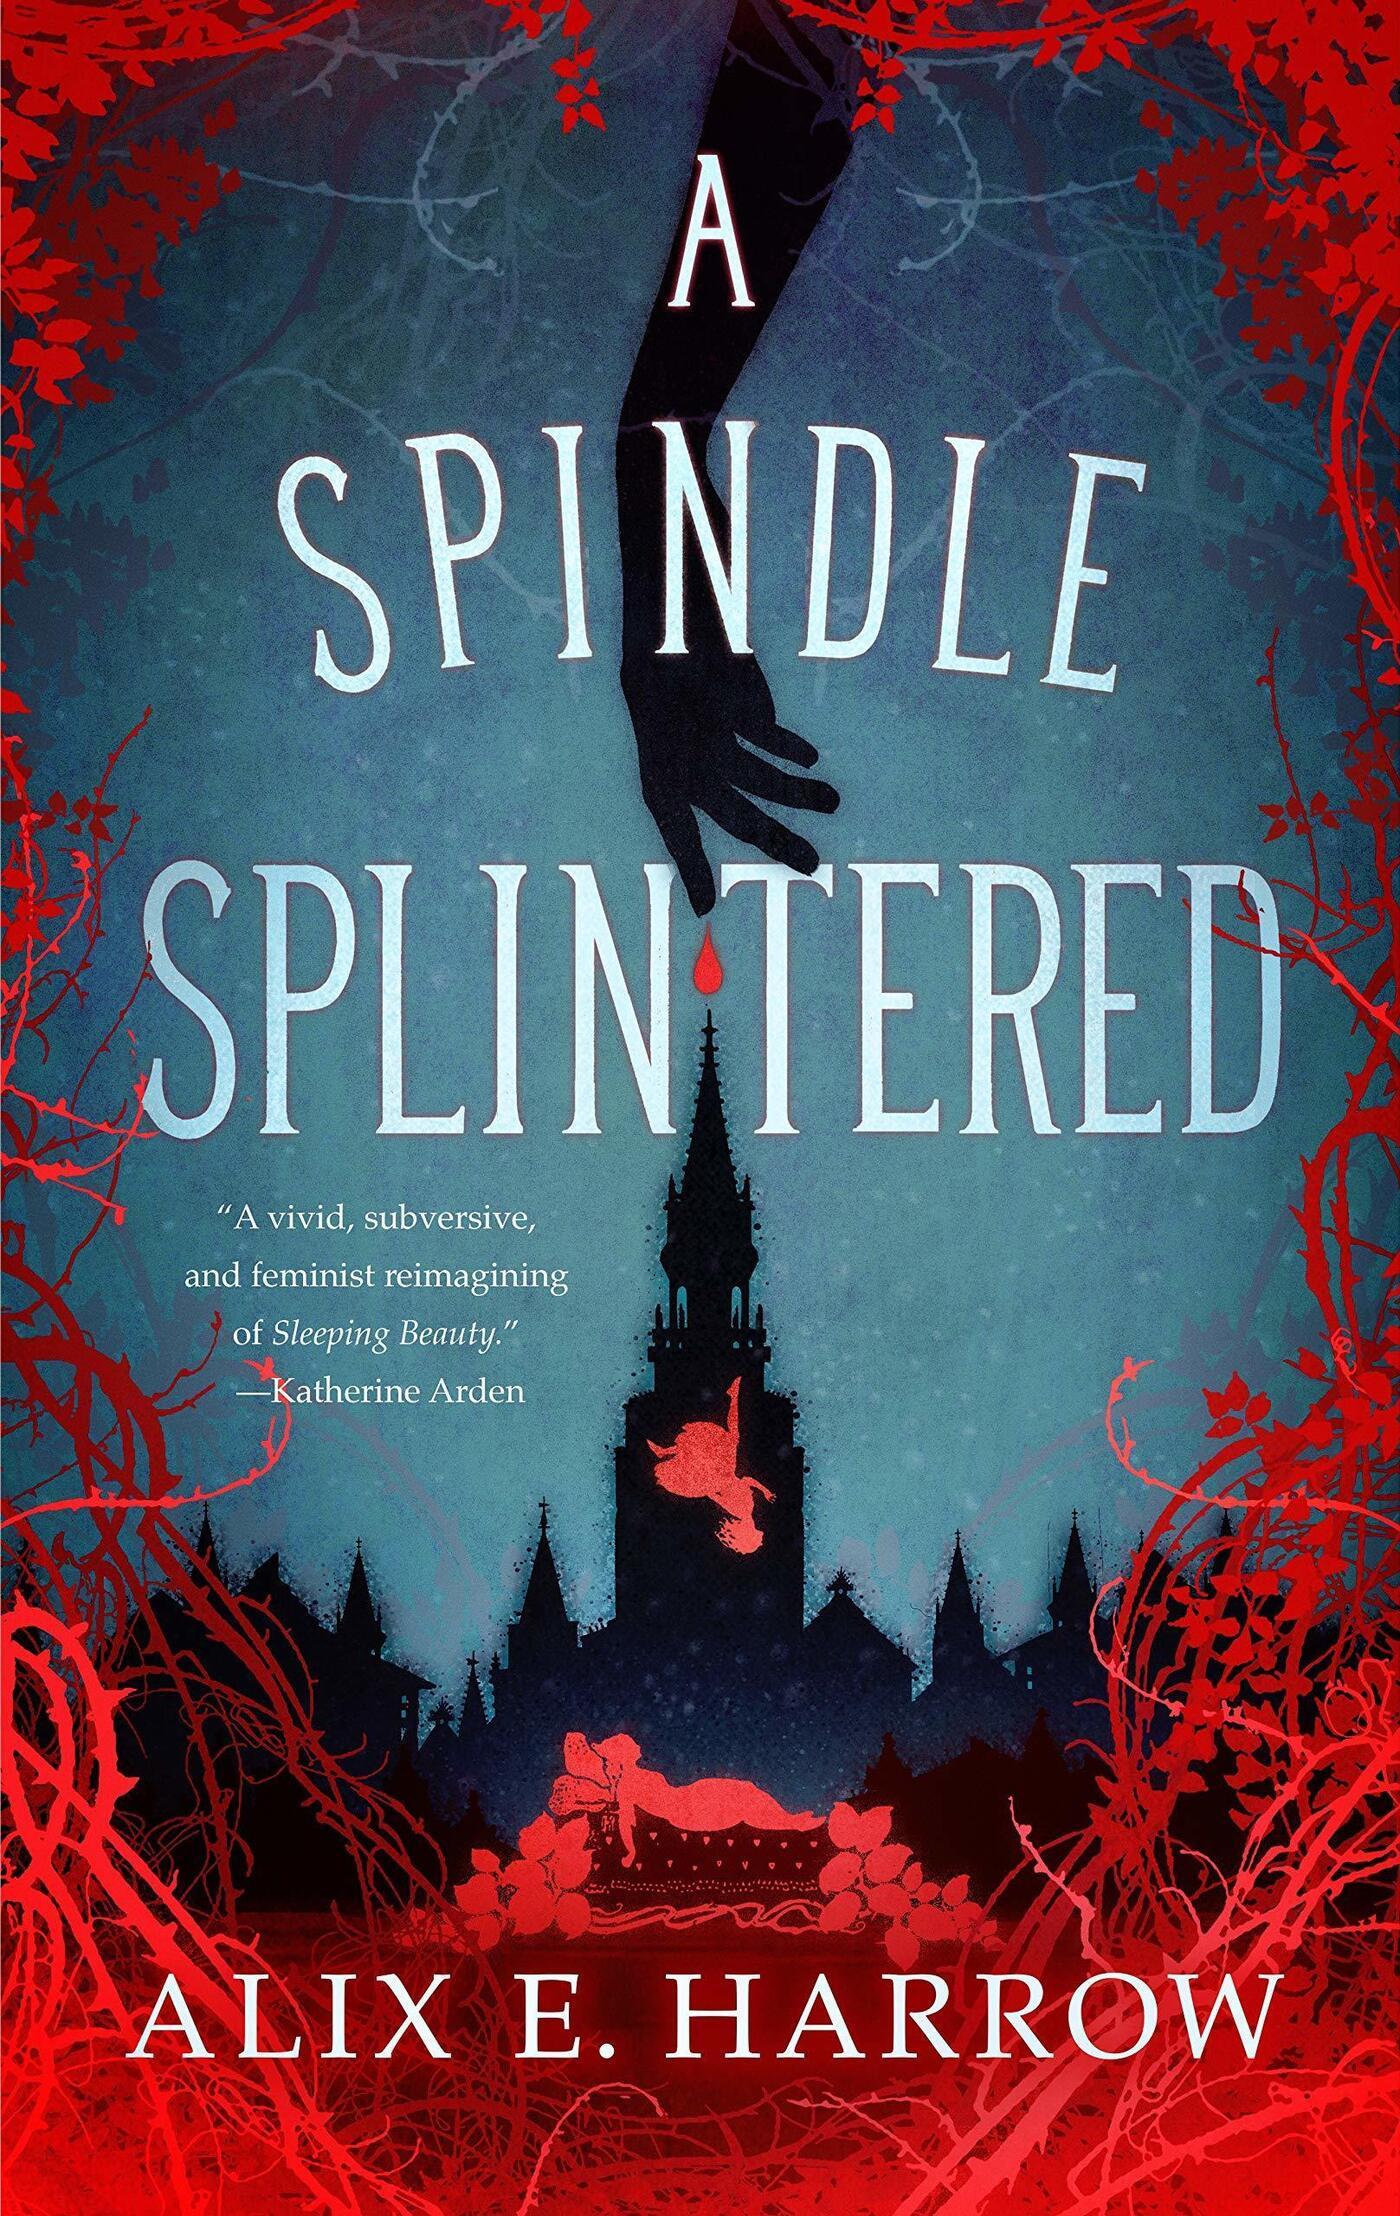 A Spindle Splintered, by Alix E. Harrow